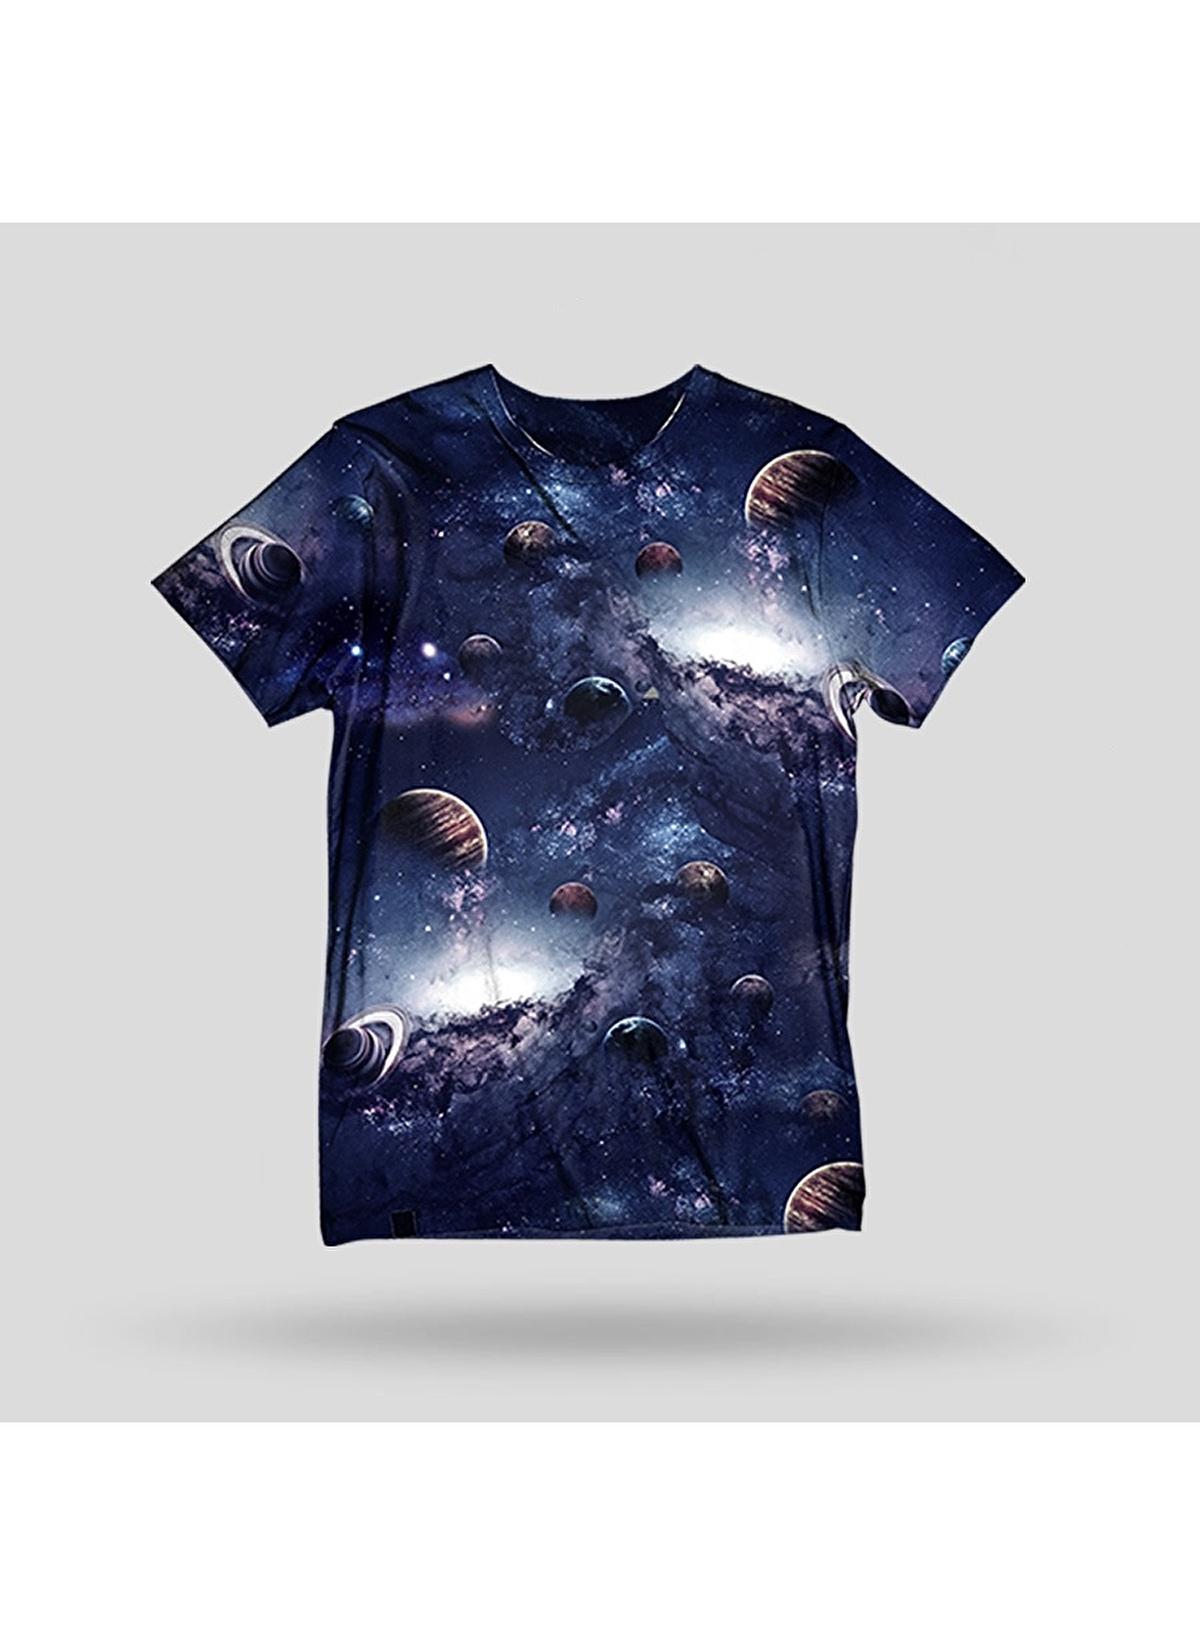 John Frank Tişört Jftd22-deep Baskılı Dijital T-shirt – 79.99 TL